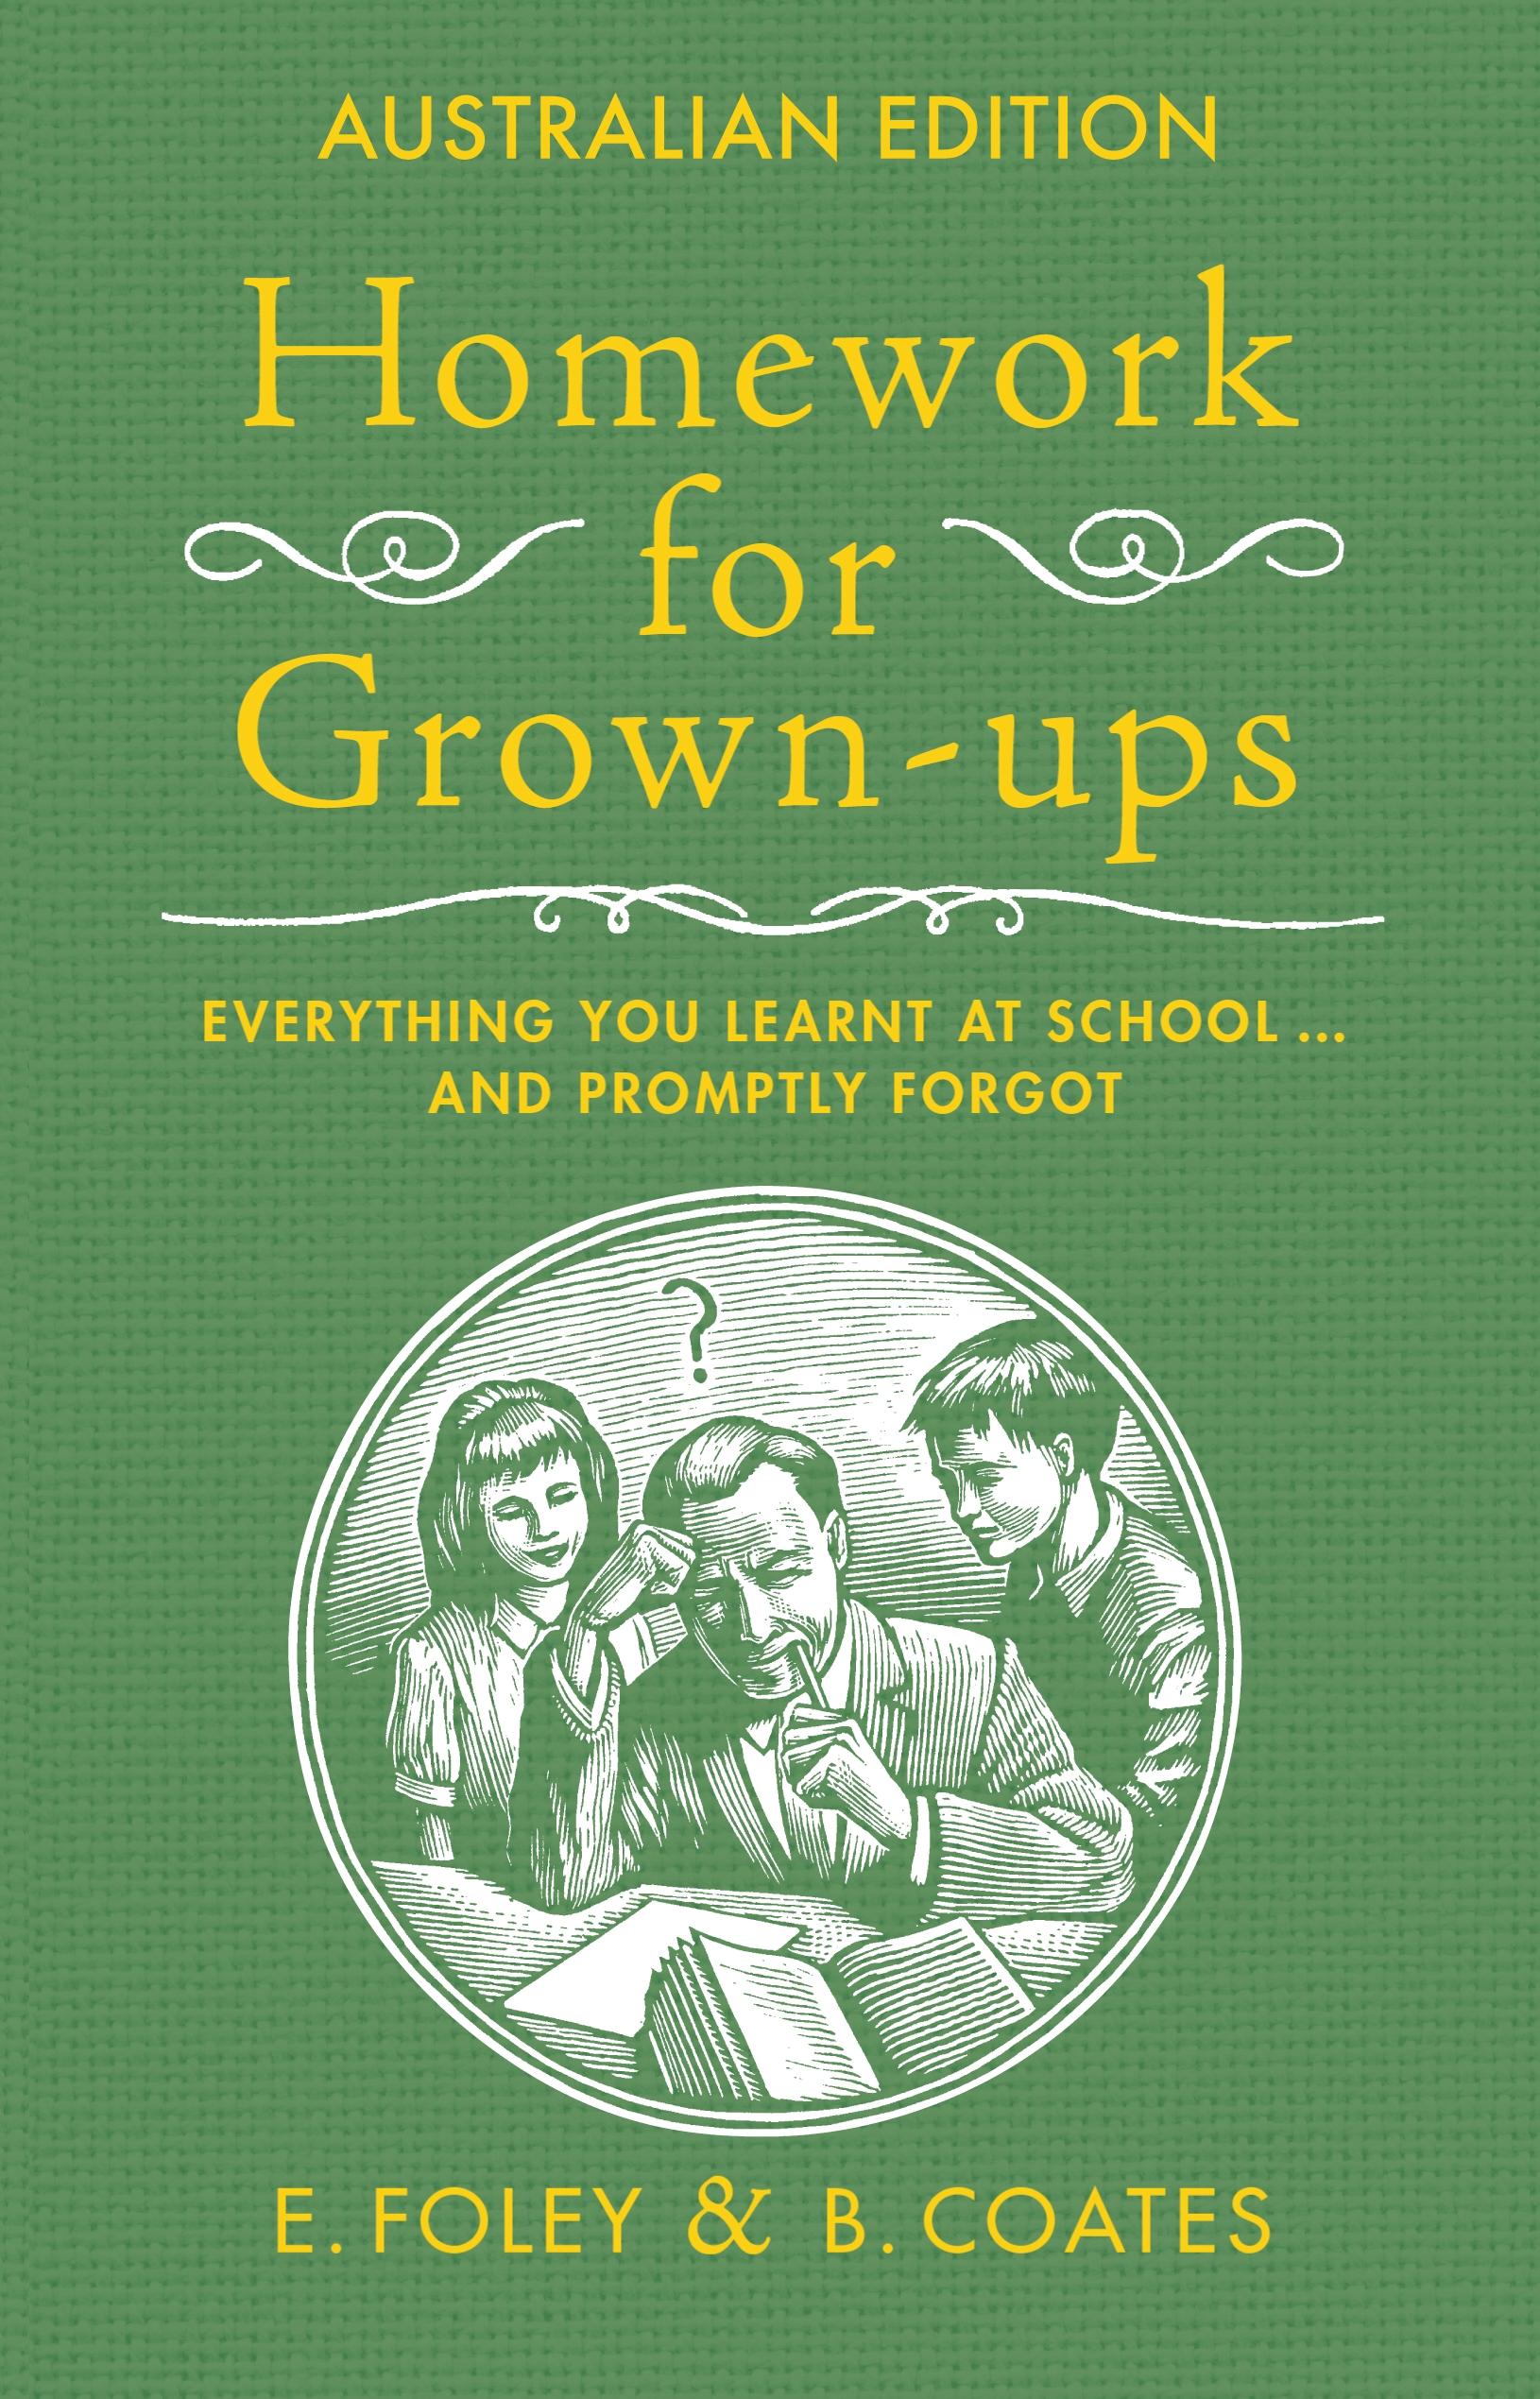 homework for grown ups book